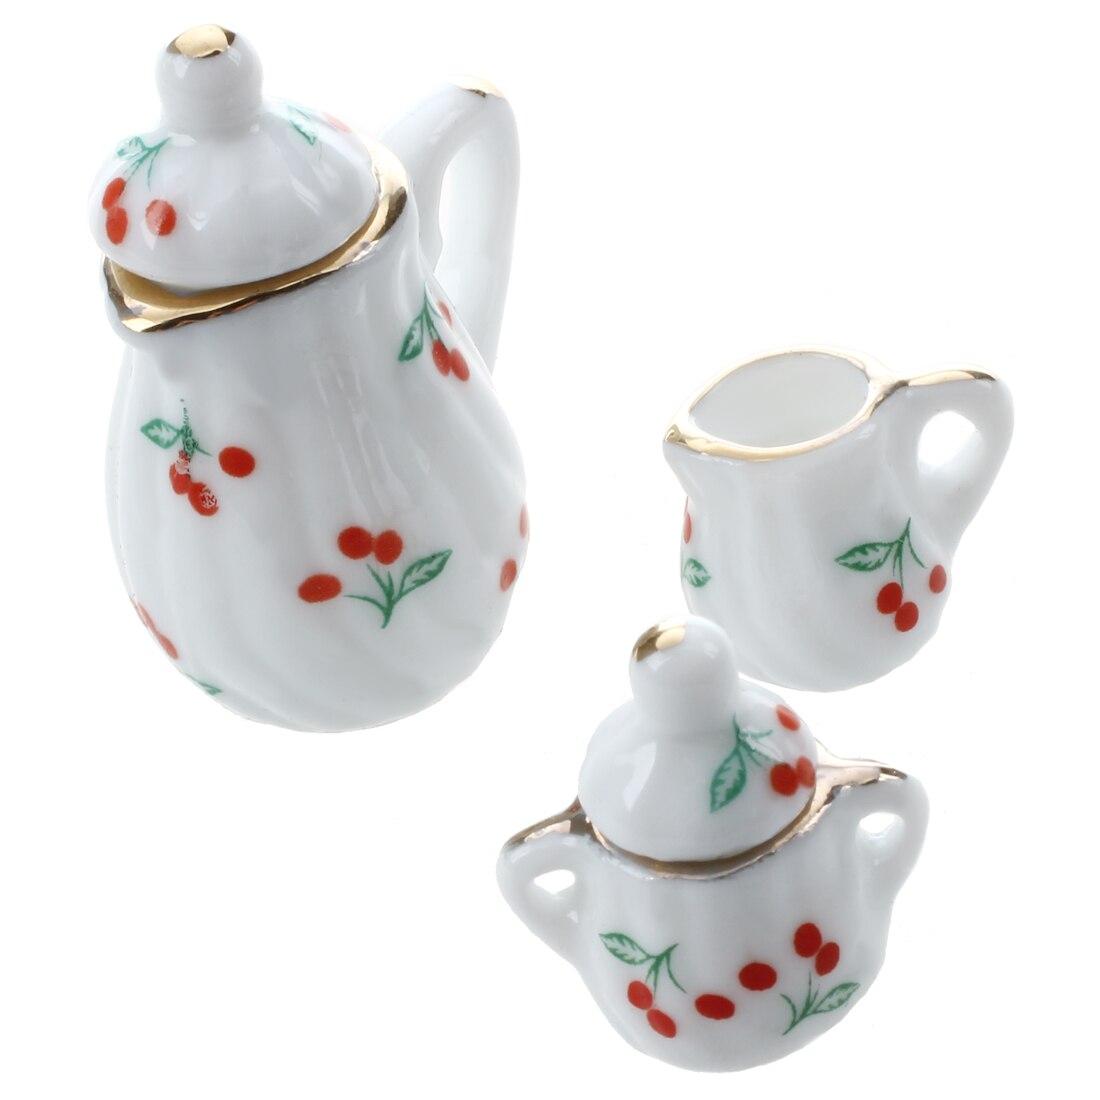 15pcs Dollhouse Miniature Dining Room Porcelain Tea Set Dish Cup Red Cherry